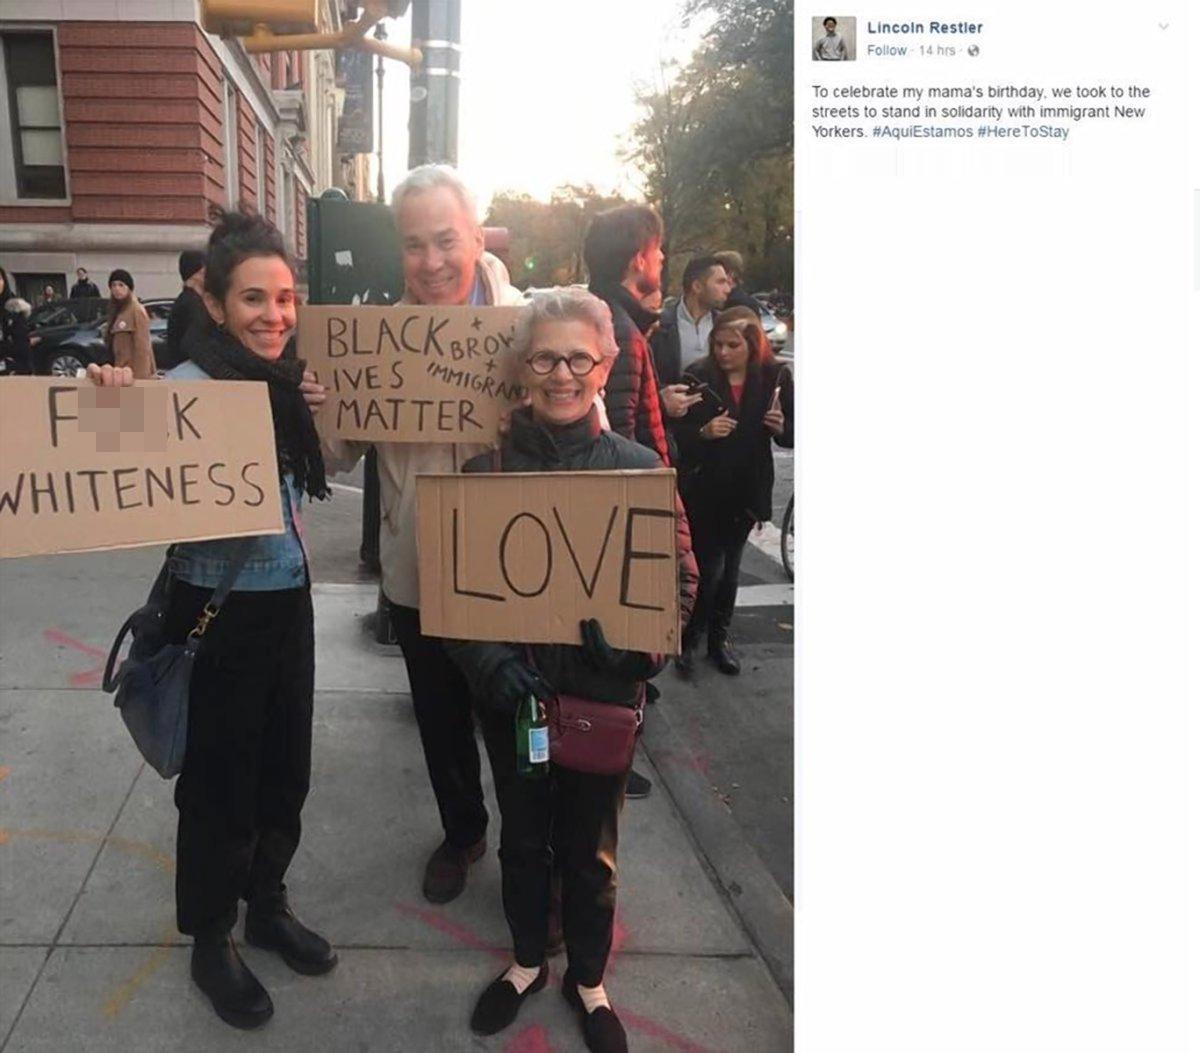 Backlash After De Blasio Staffer Posts 'F*** WHITENESS' Photo